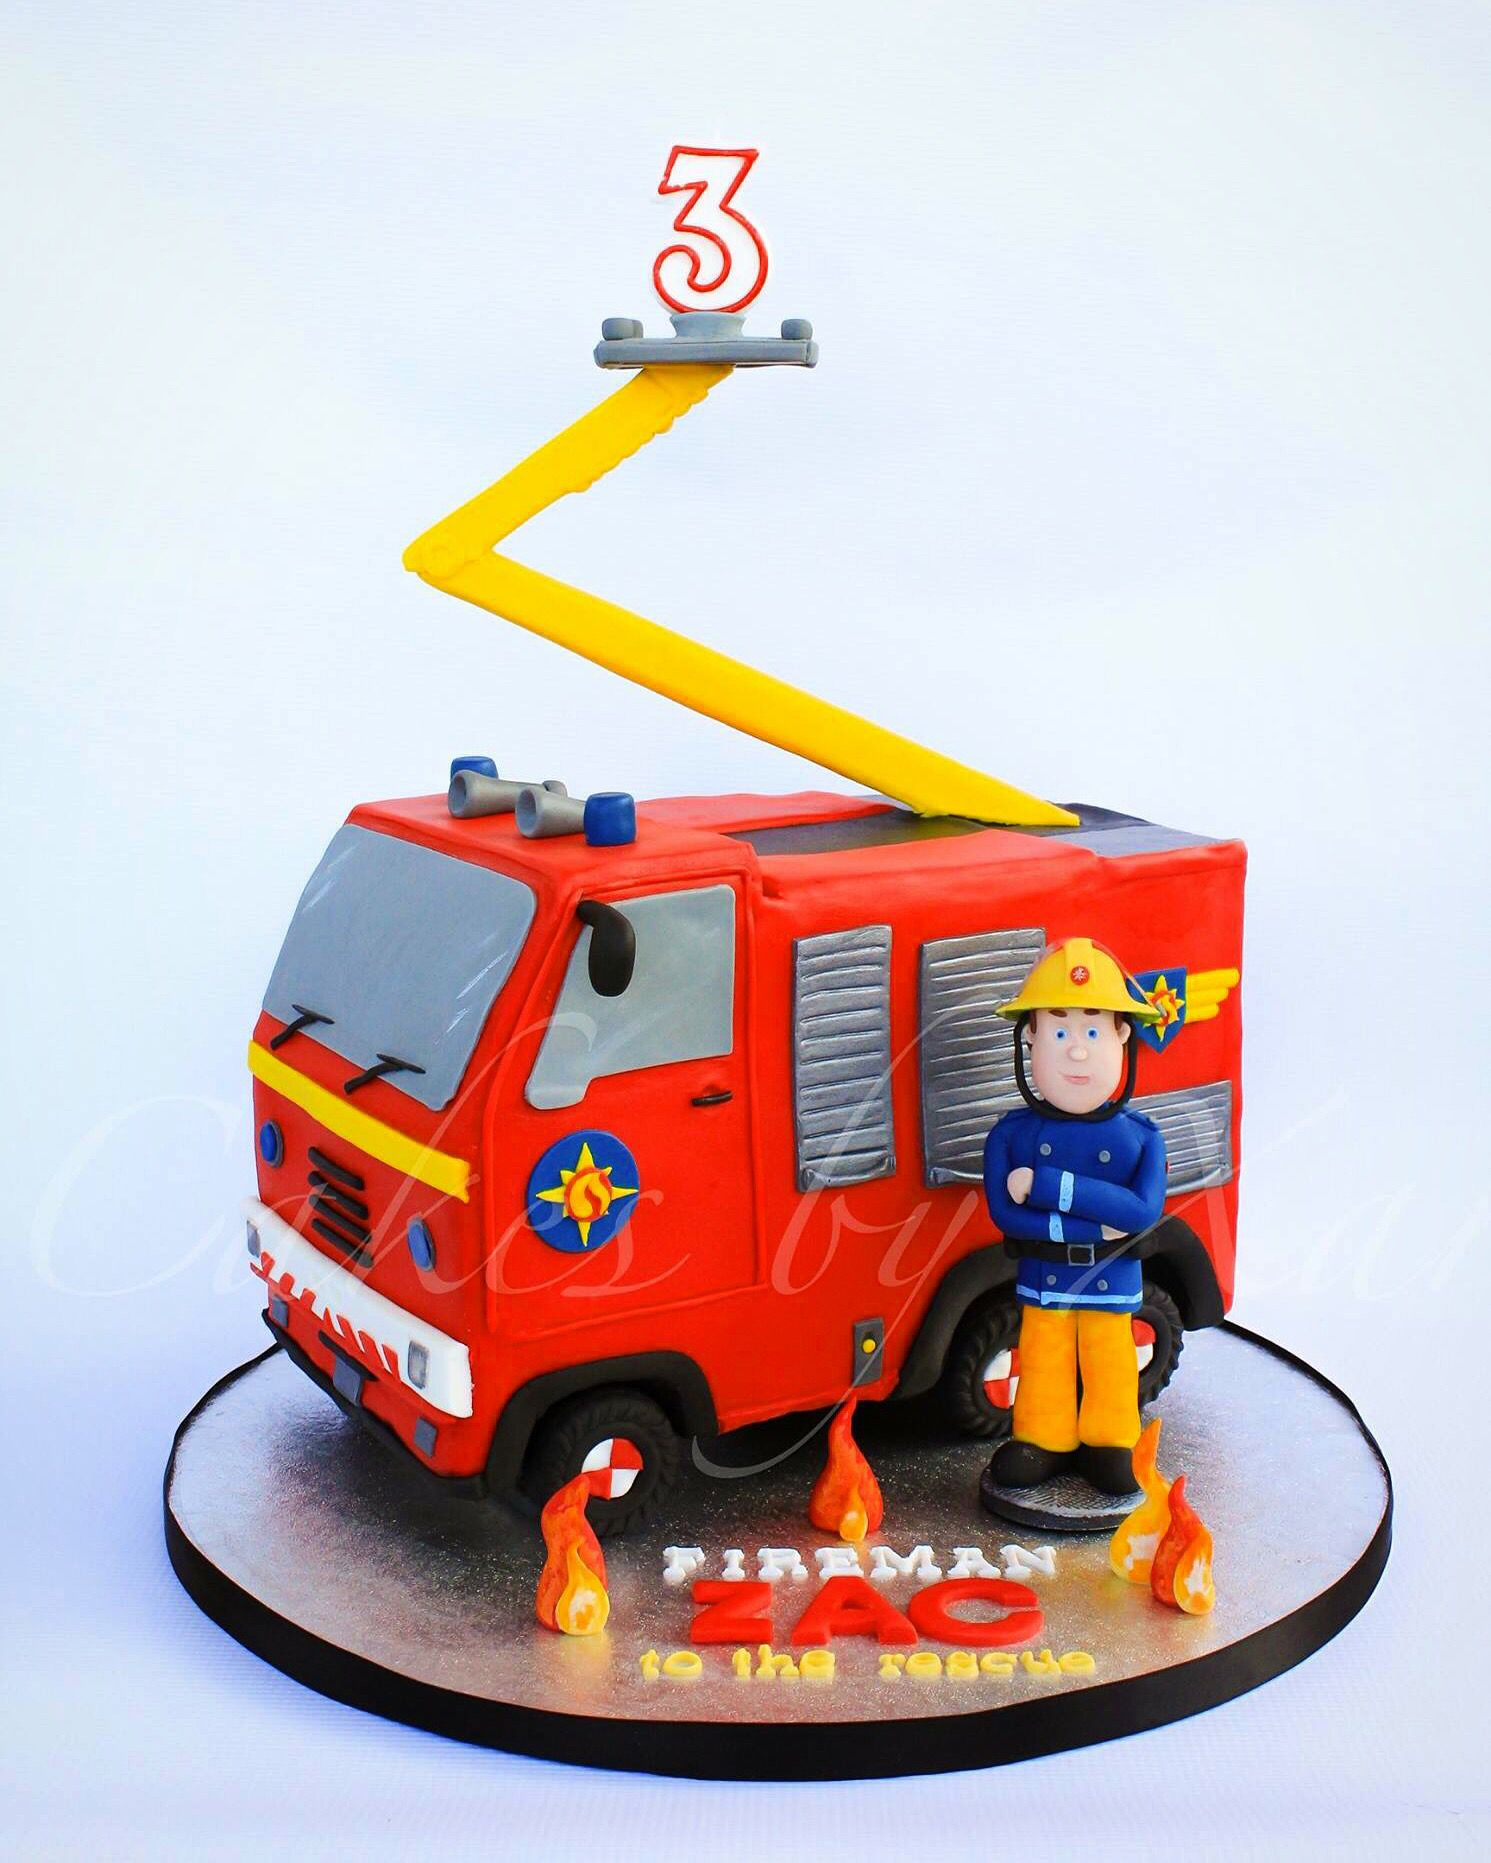 Fireman Sam Cake wwwfacebookcomcakesbyxar  backen  Pinterest  Feuerwehrmann sam